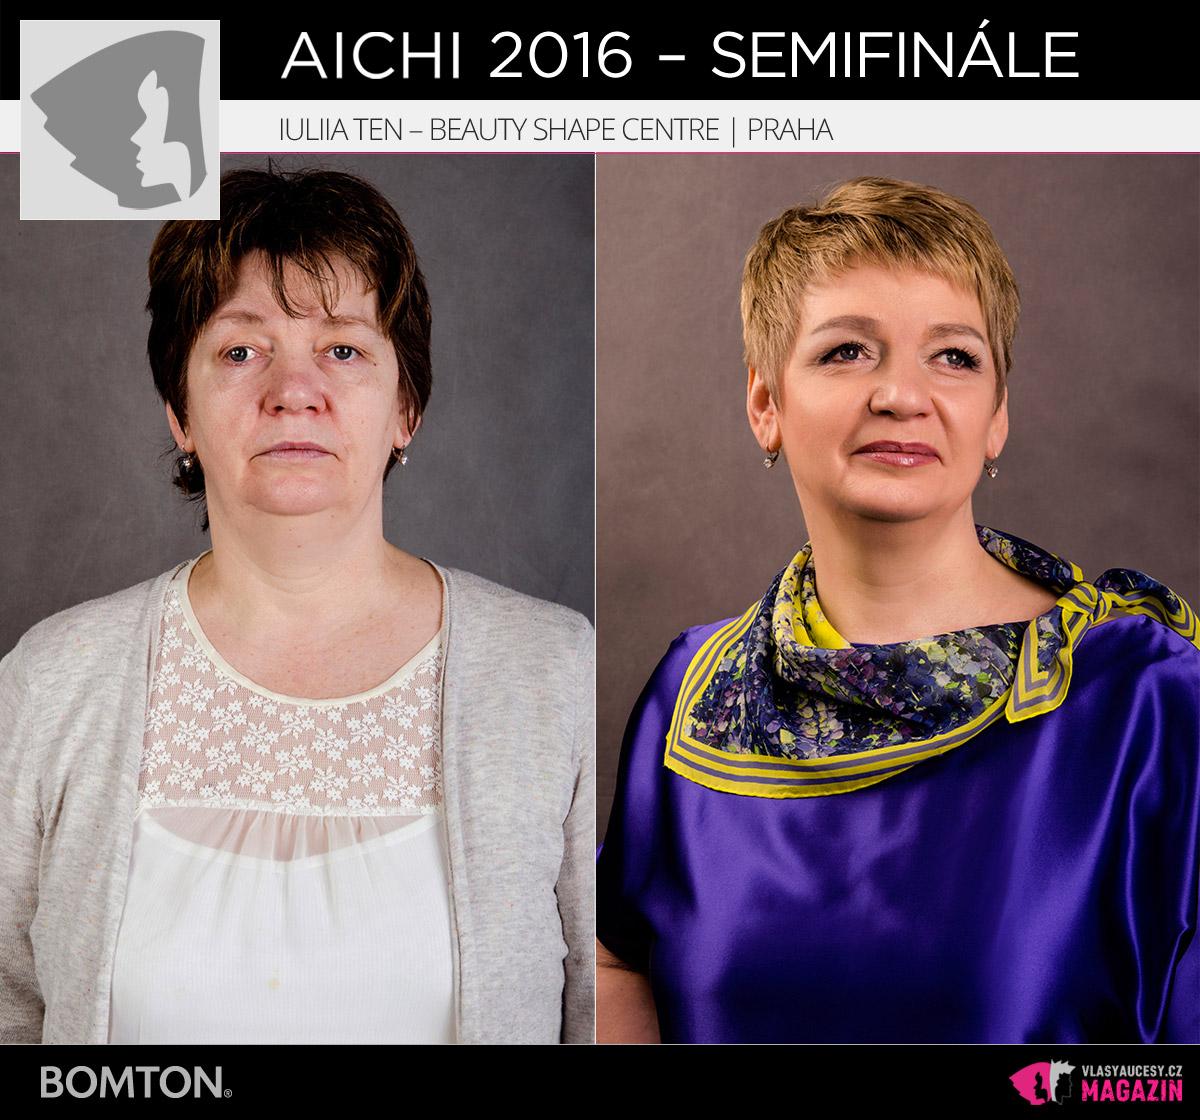 Nominační proměna AICHI 2016: Iuliia Ten, Beauty Shape Centre, Praha